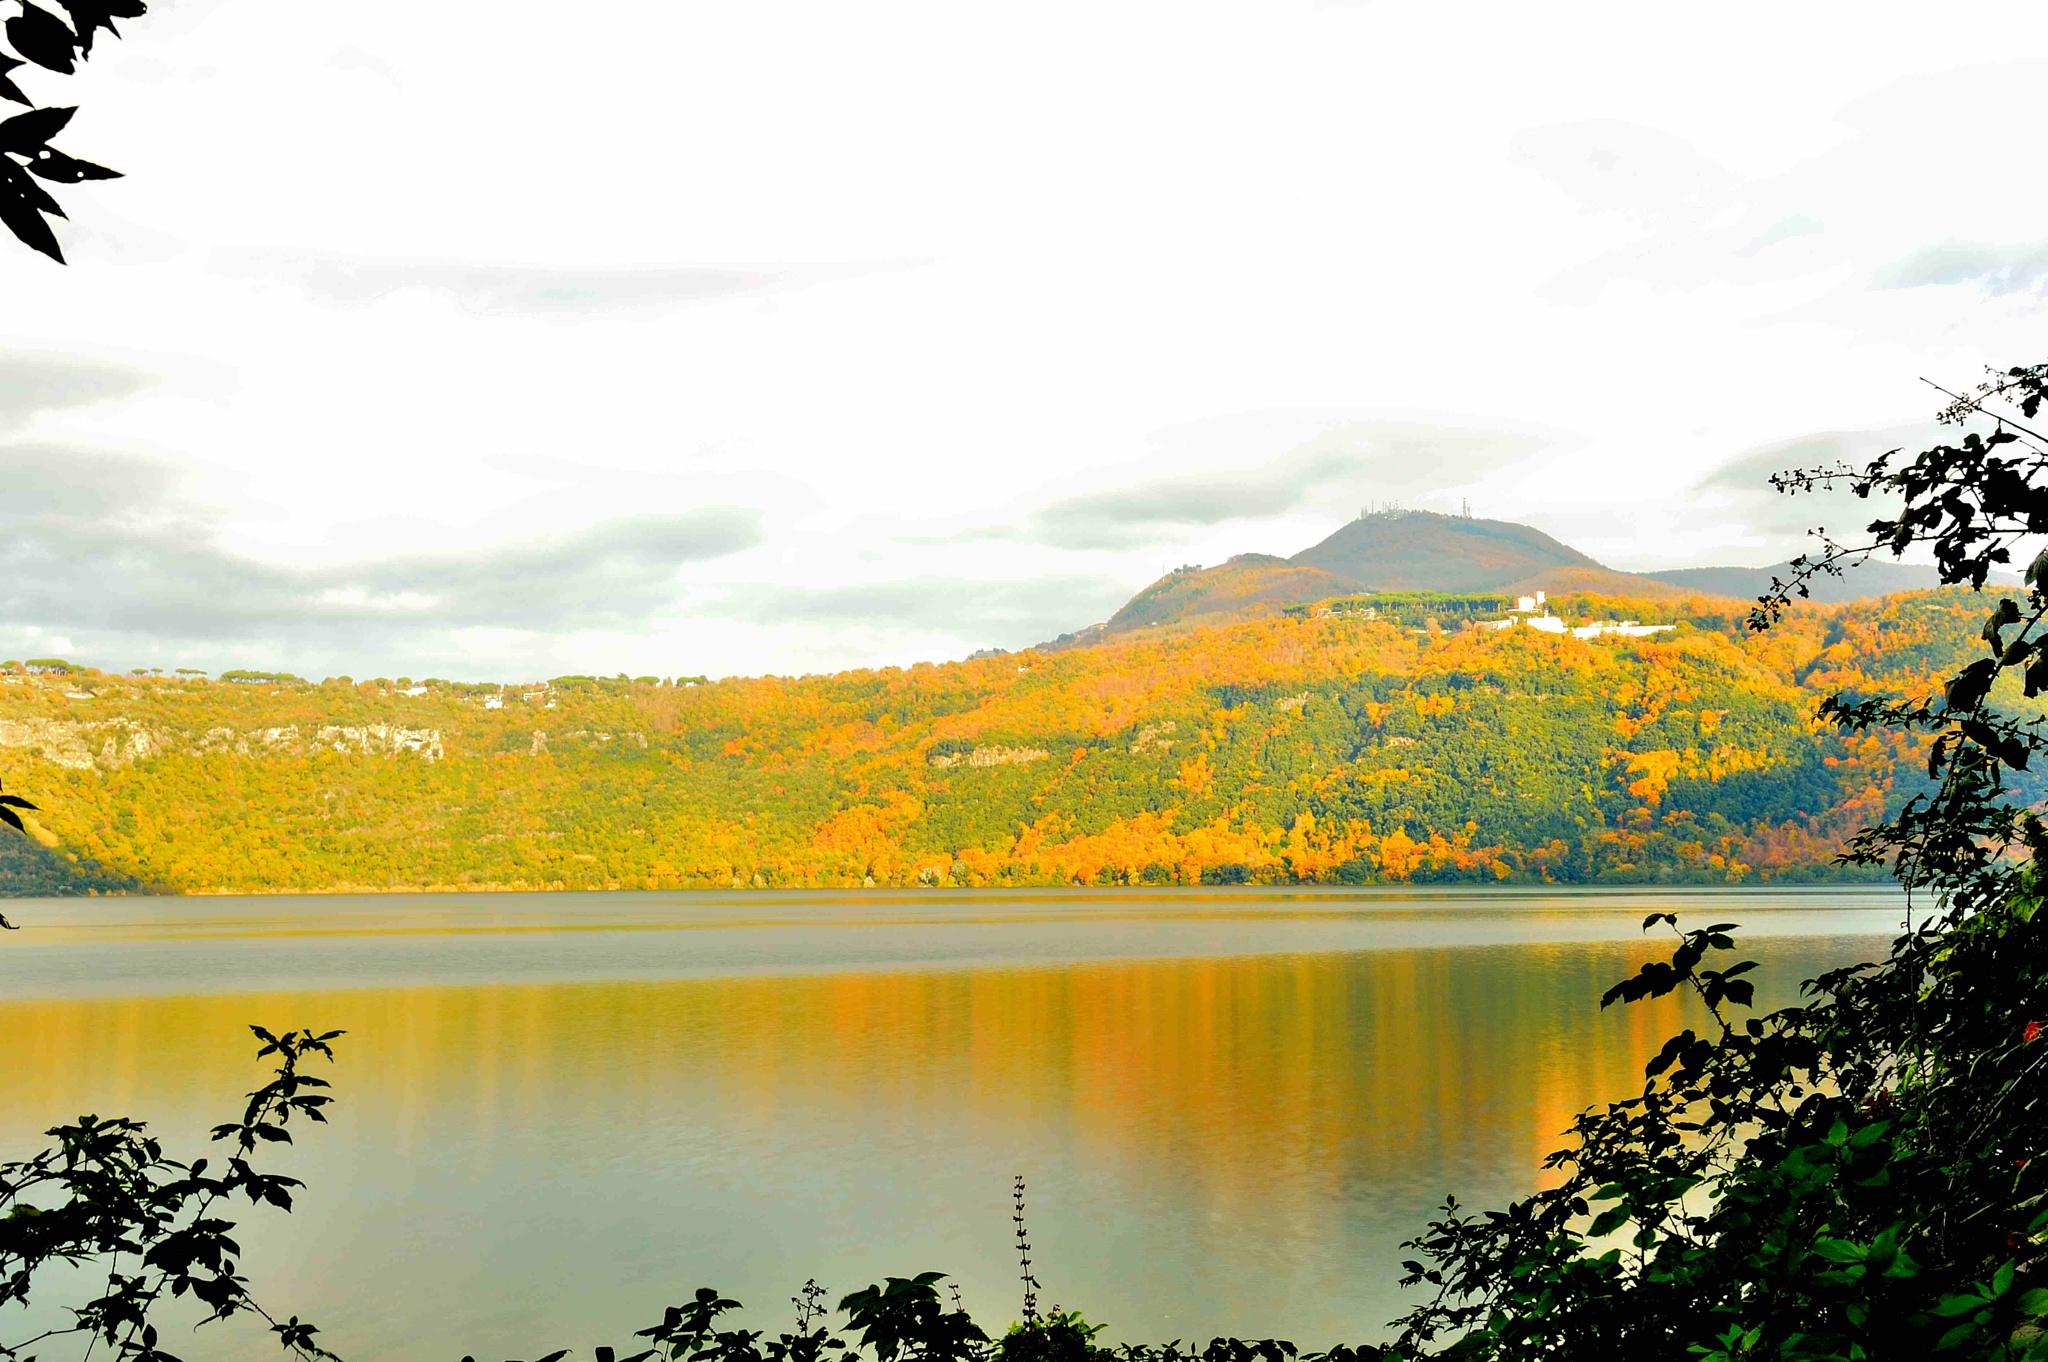 yellow autumn in the lake by Dino Almonac